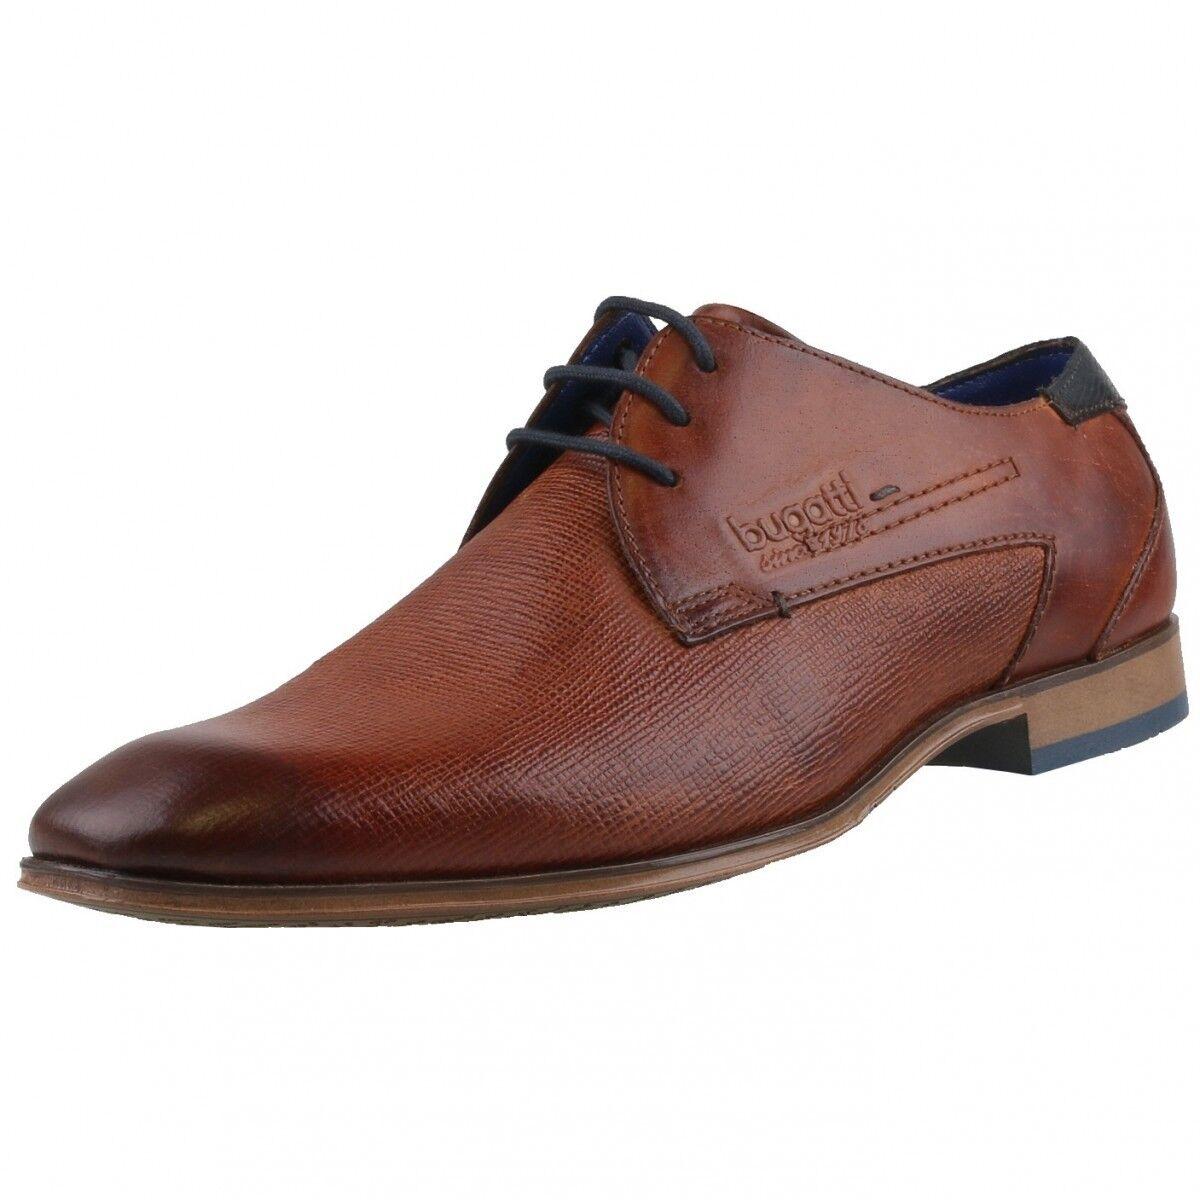 NEU bugatti Herrenschuhe Business-Schuhe Lederschuhe Schnürschuhe Halbschuhe